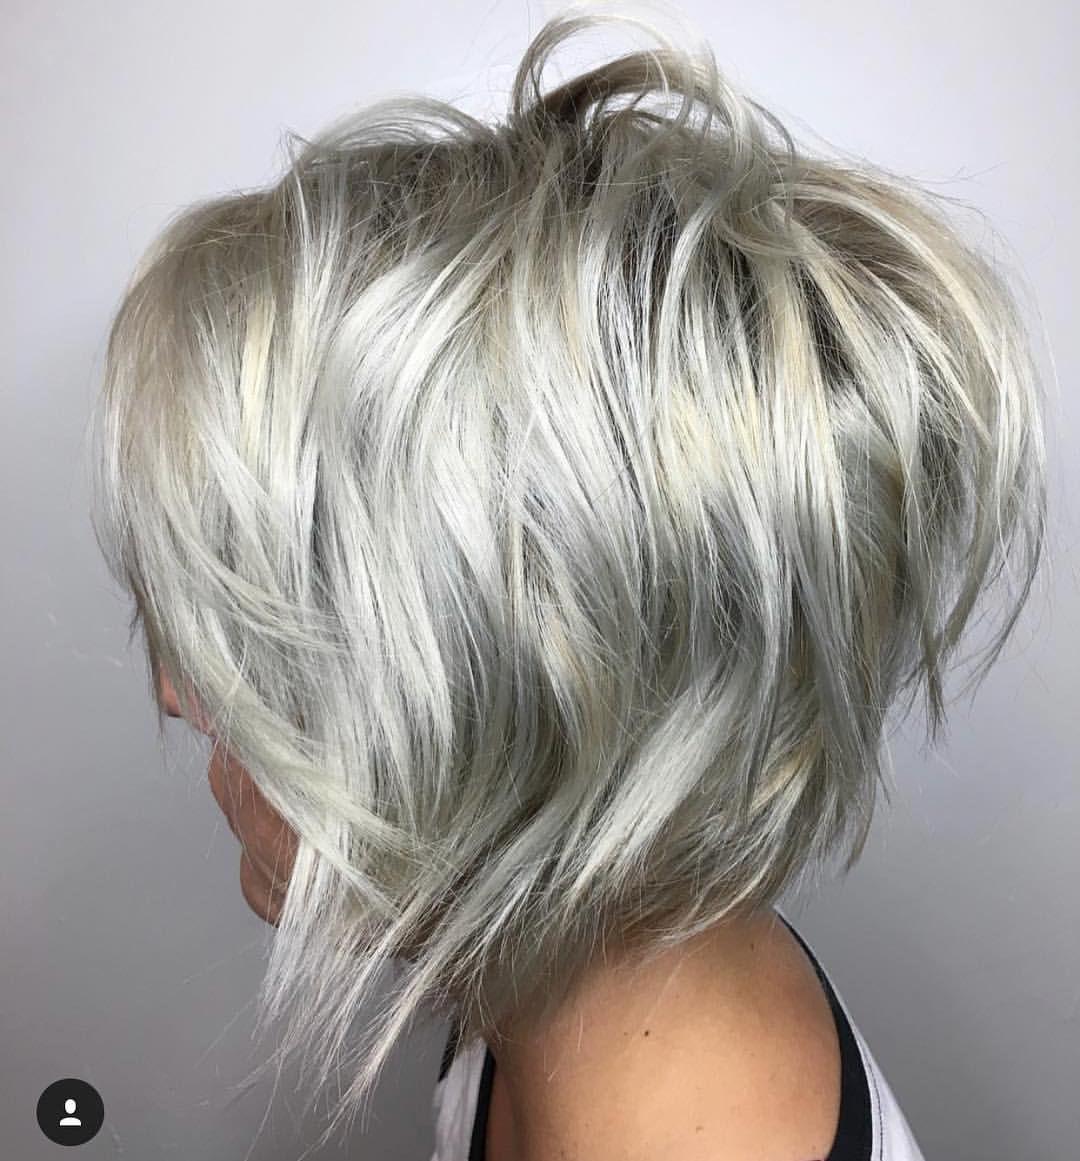 LYFE 🌍 Photo 📷 Inspired ✈ PVD On Instagram: U201cAmazing 😉 Color And Cut ✂ ✂  @styled_by_carolynn 👌🏼👌🏼👌🏼u201d. Short Bob Haircut ...